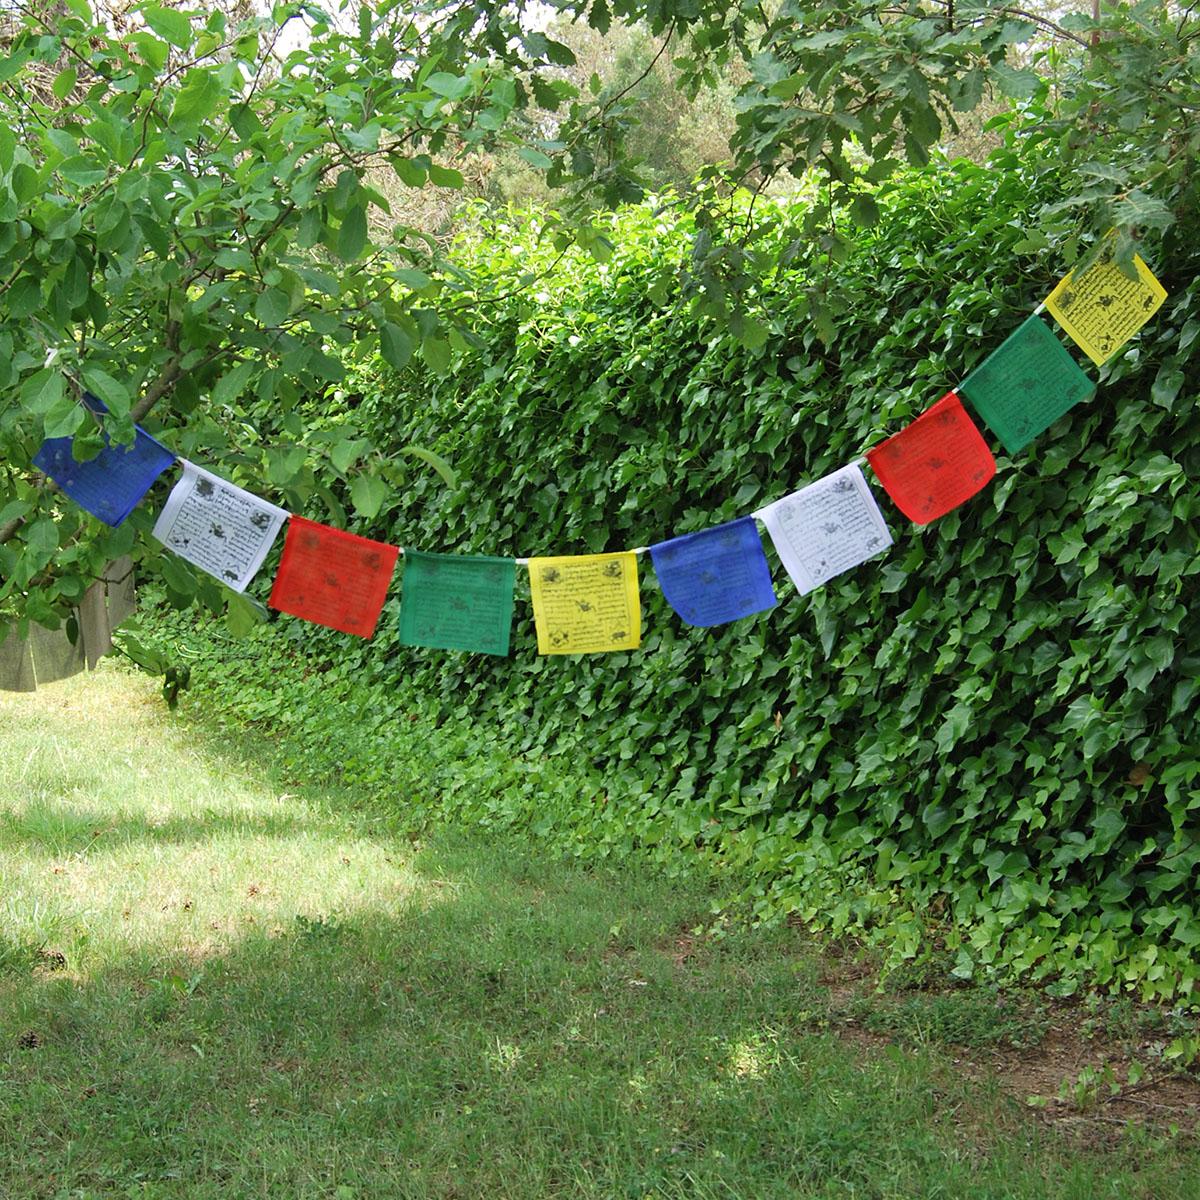 tibetimport.com, ver productos de la familia Banderas Tibetanas